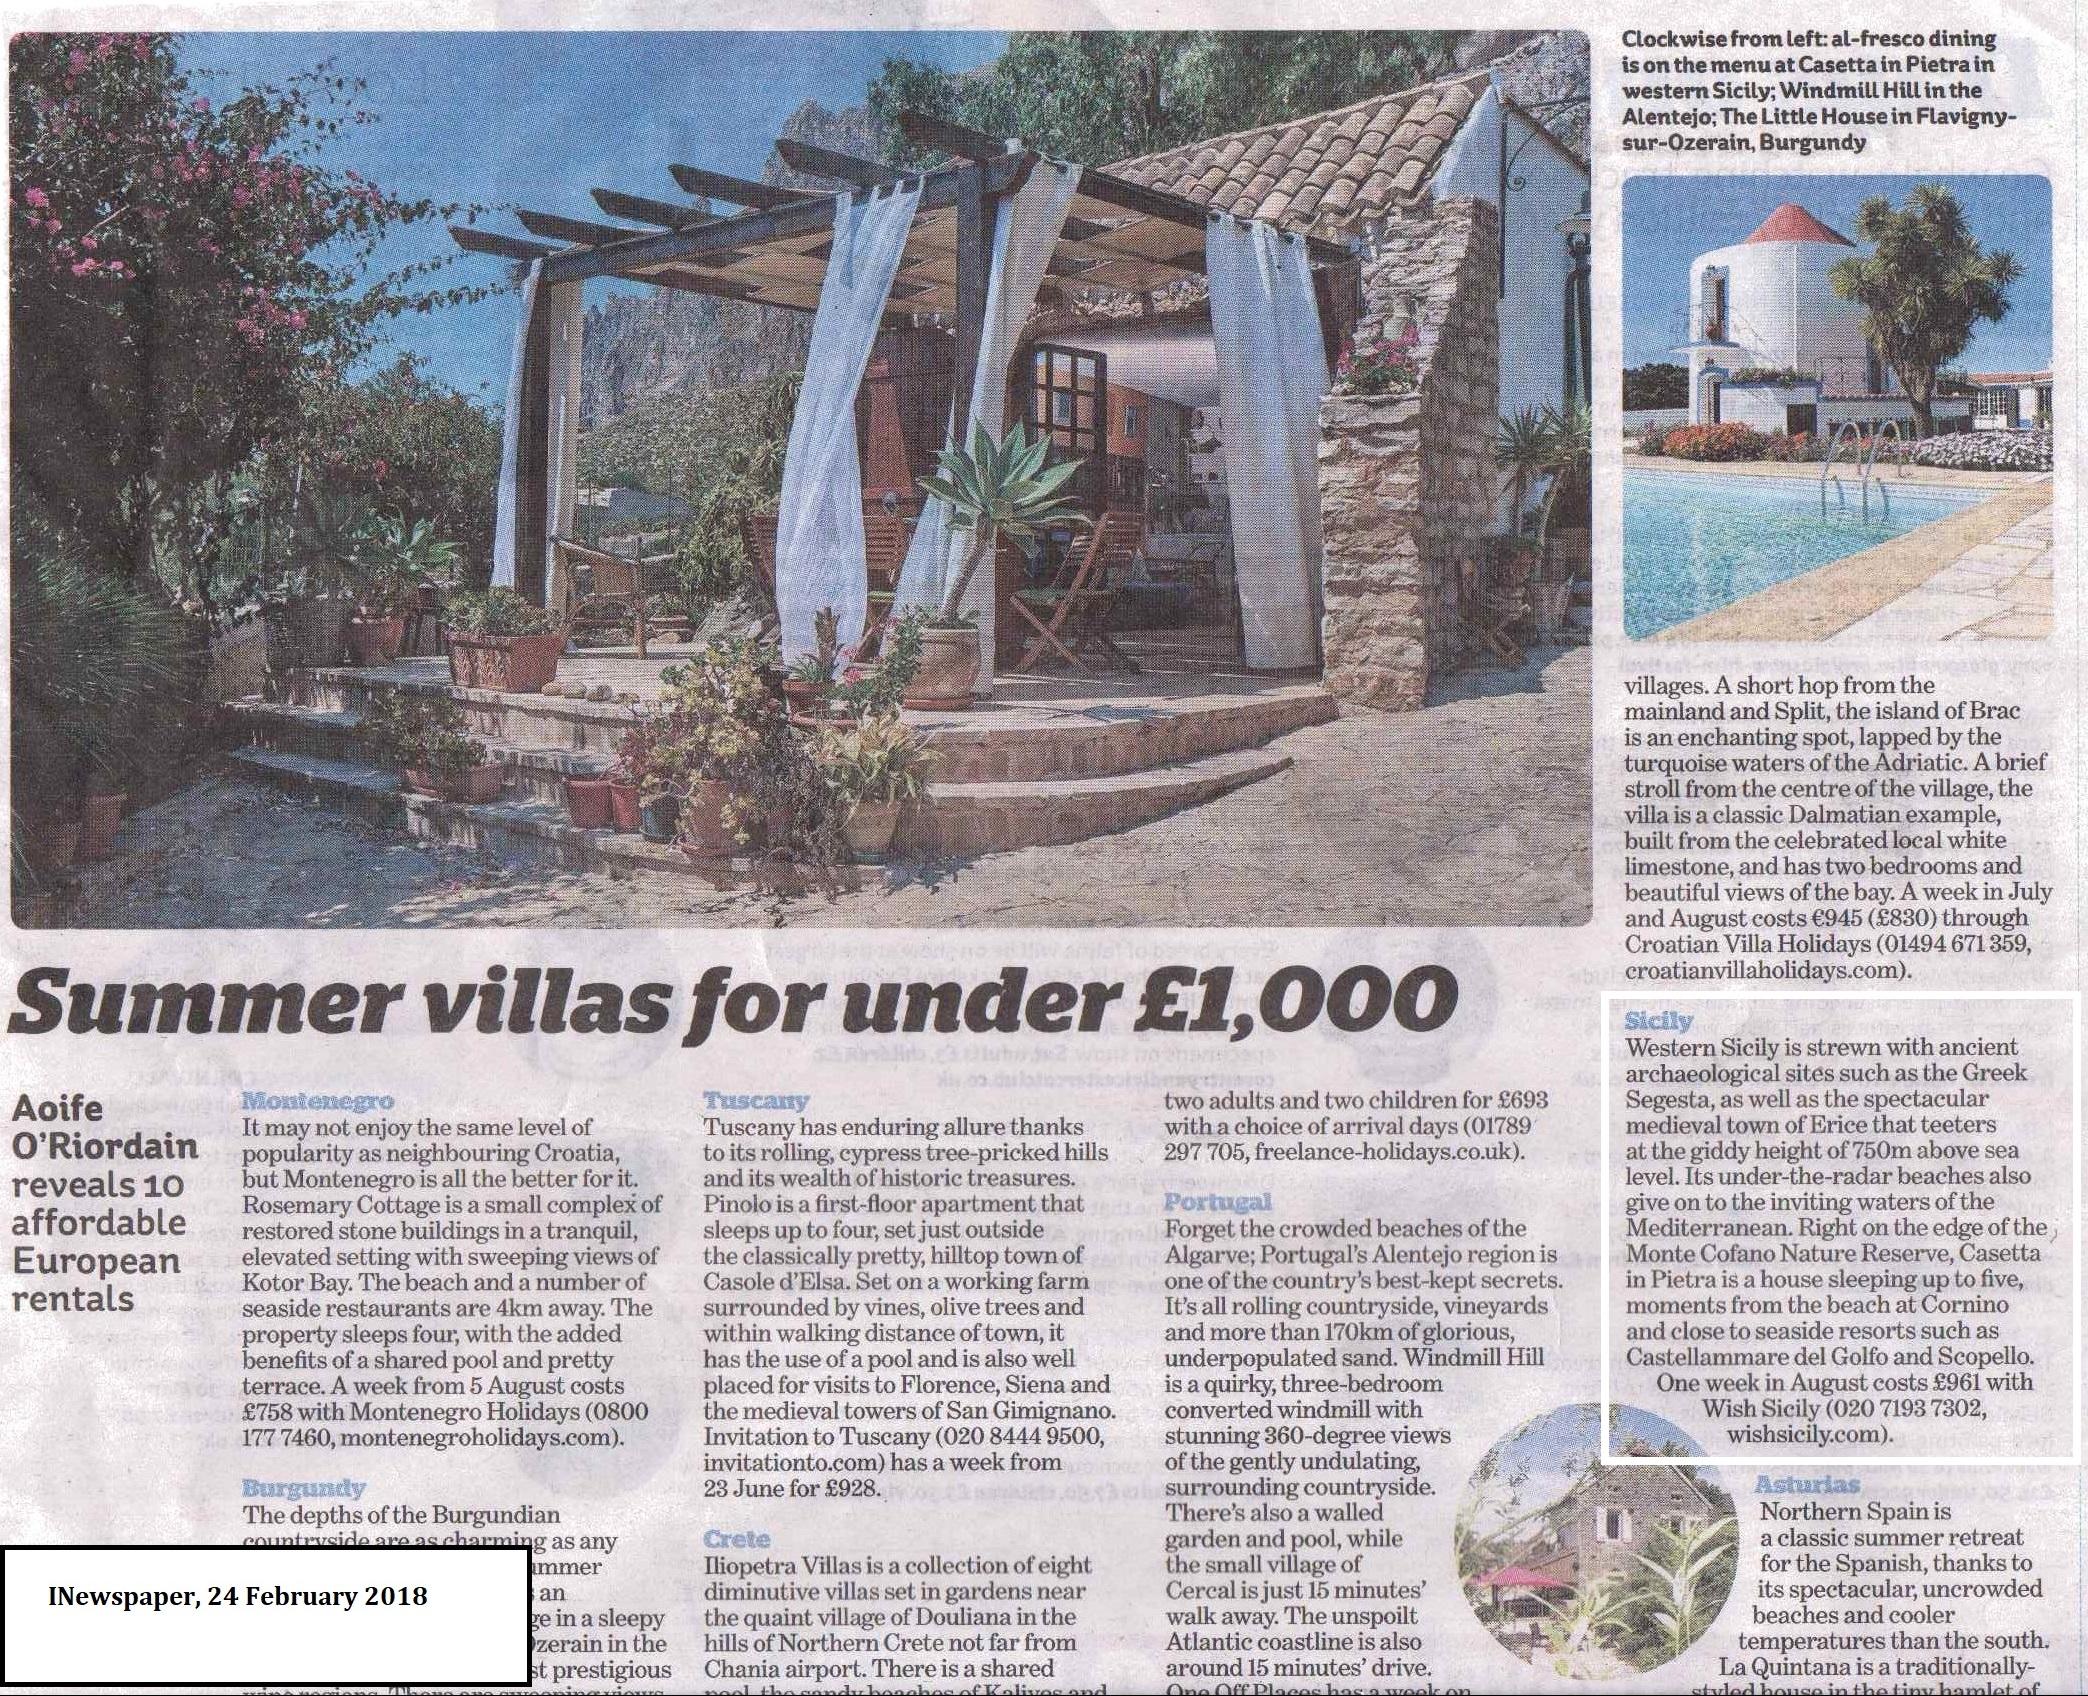 https://inews.co.uk/inews-lifestyle/travel/best-seaside-villas-2017/